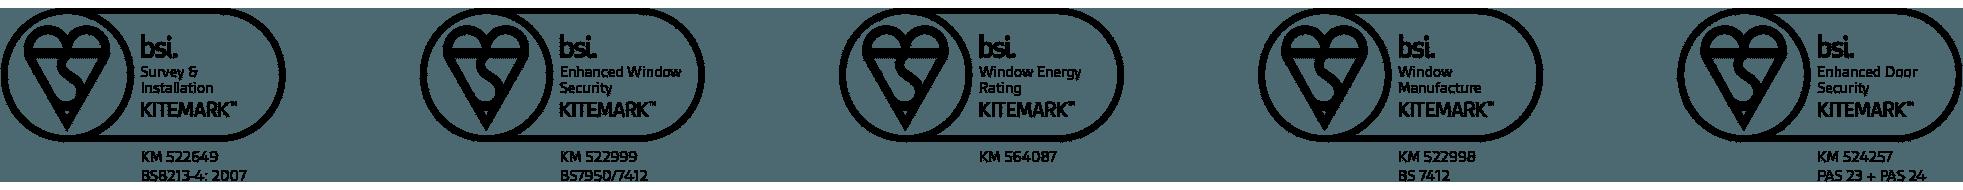 Quality guaranteed through BSi Kitemarks